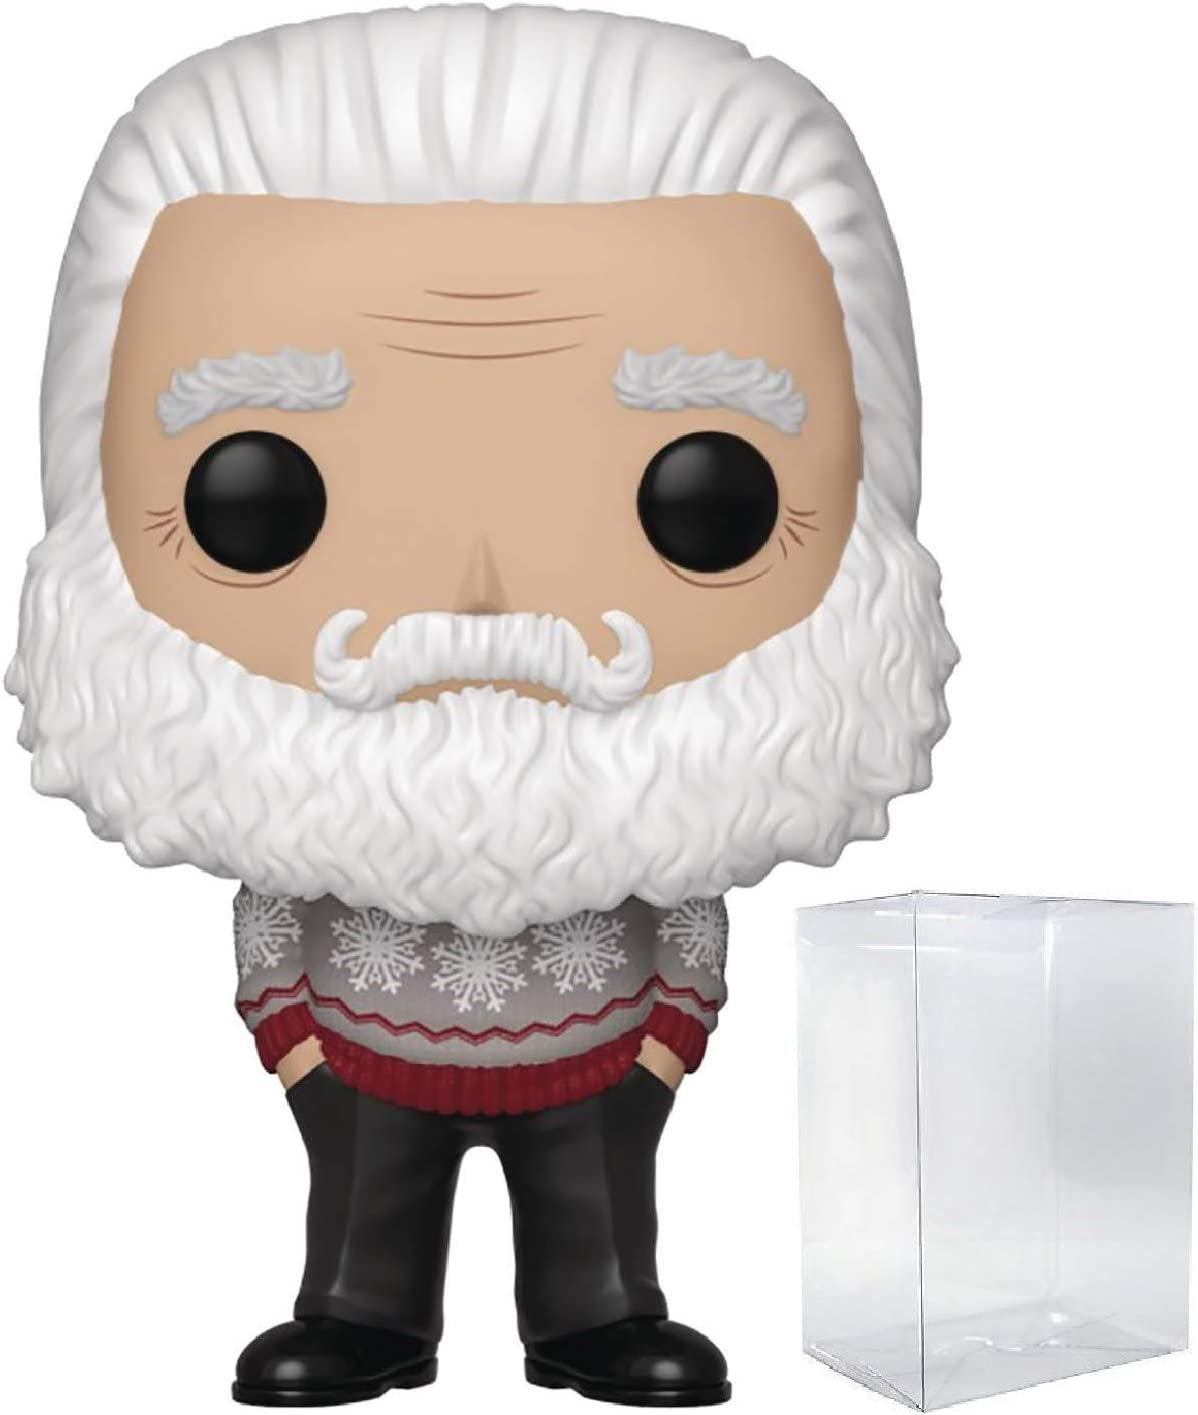 Pop Disney: Santa Clause - Tim Allen as Santa Pop! Vinyl Figure (Includes Compatible Pop Box Protector Case)